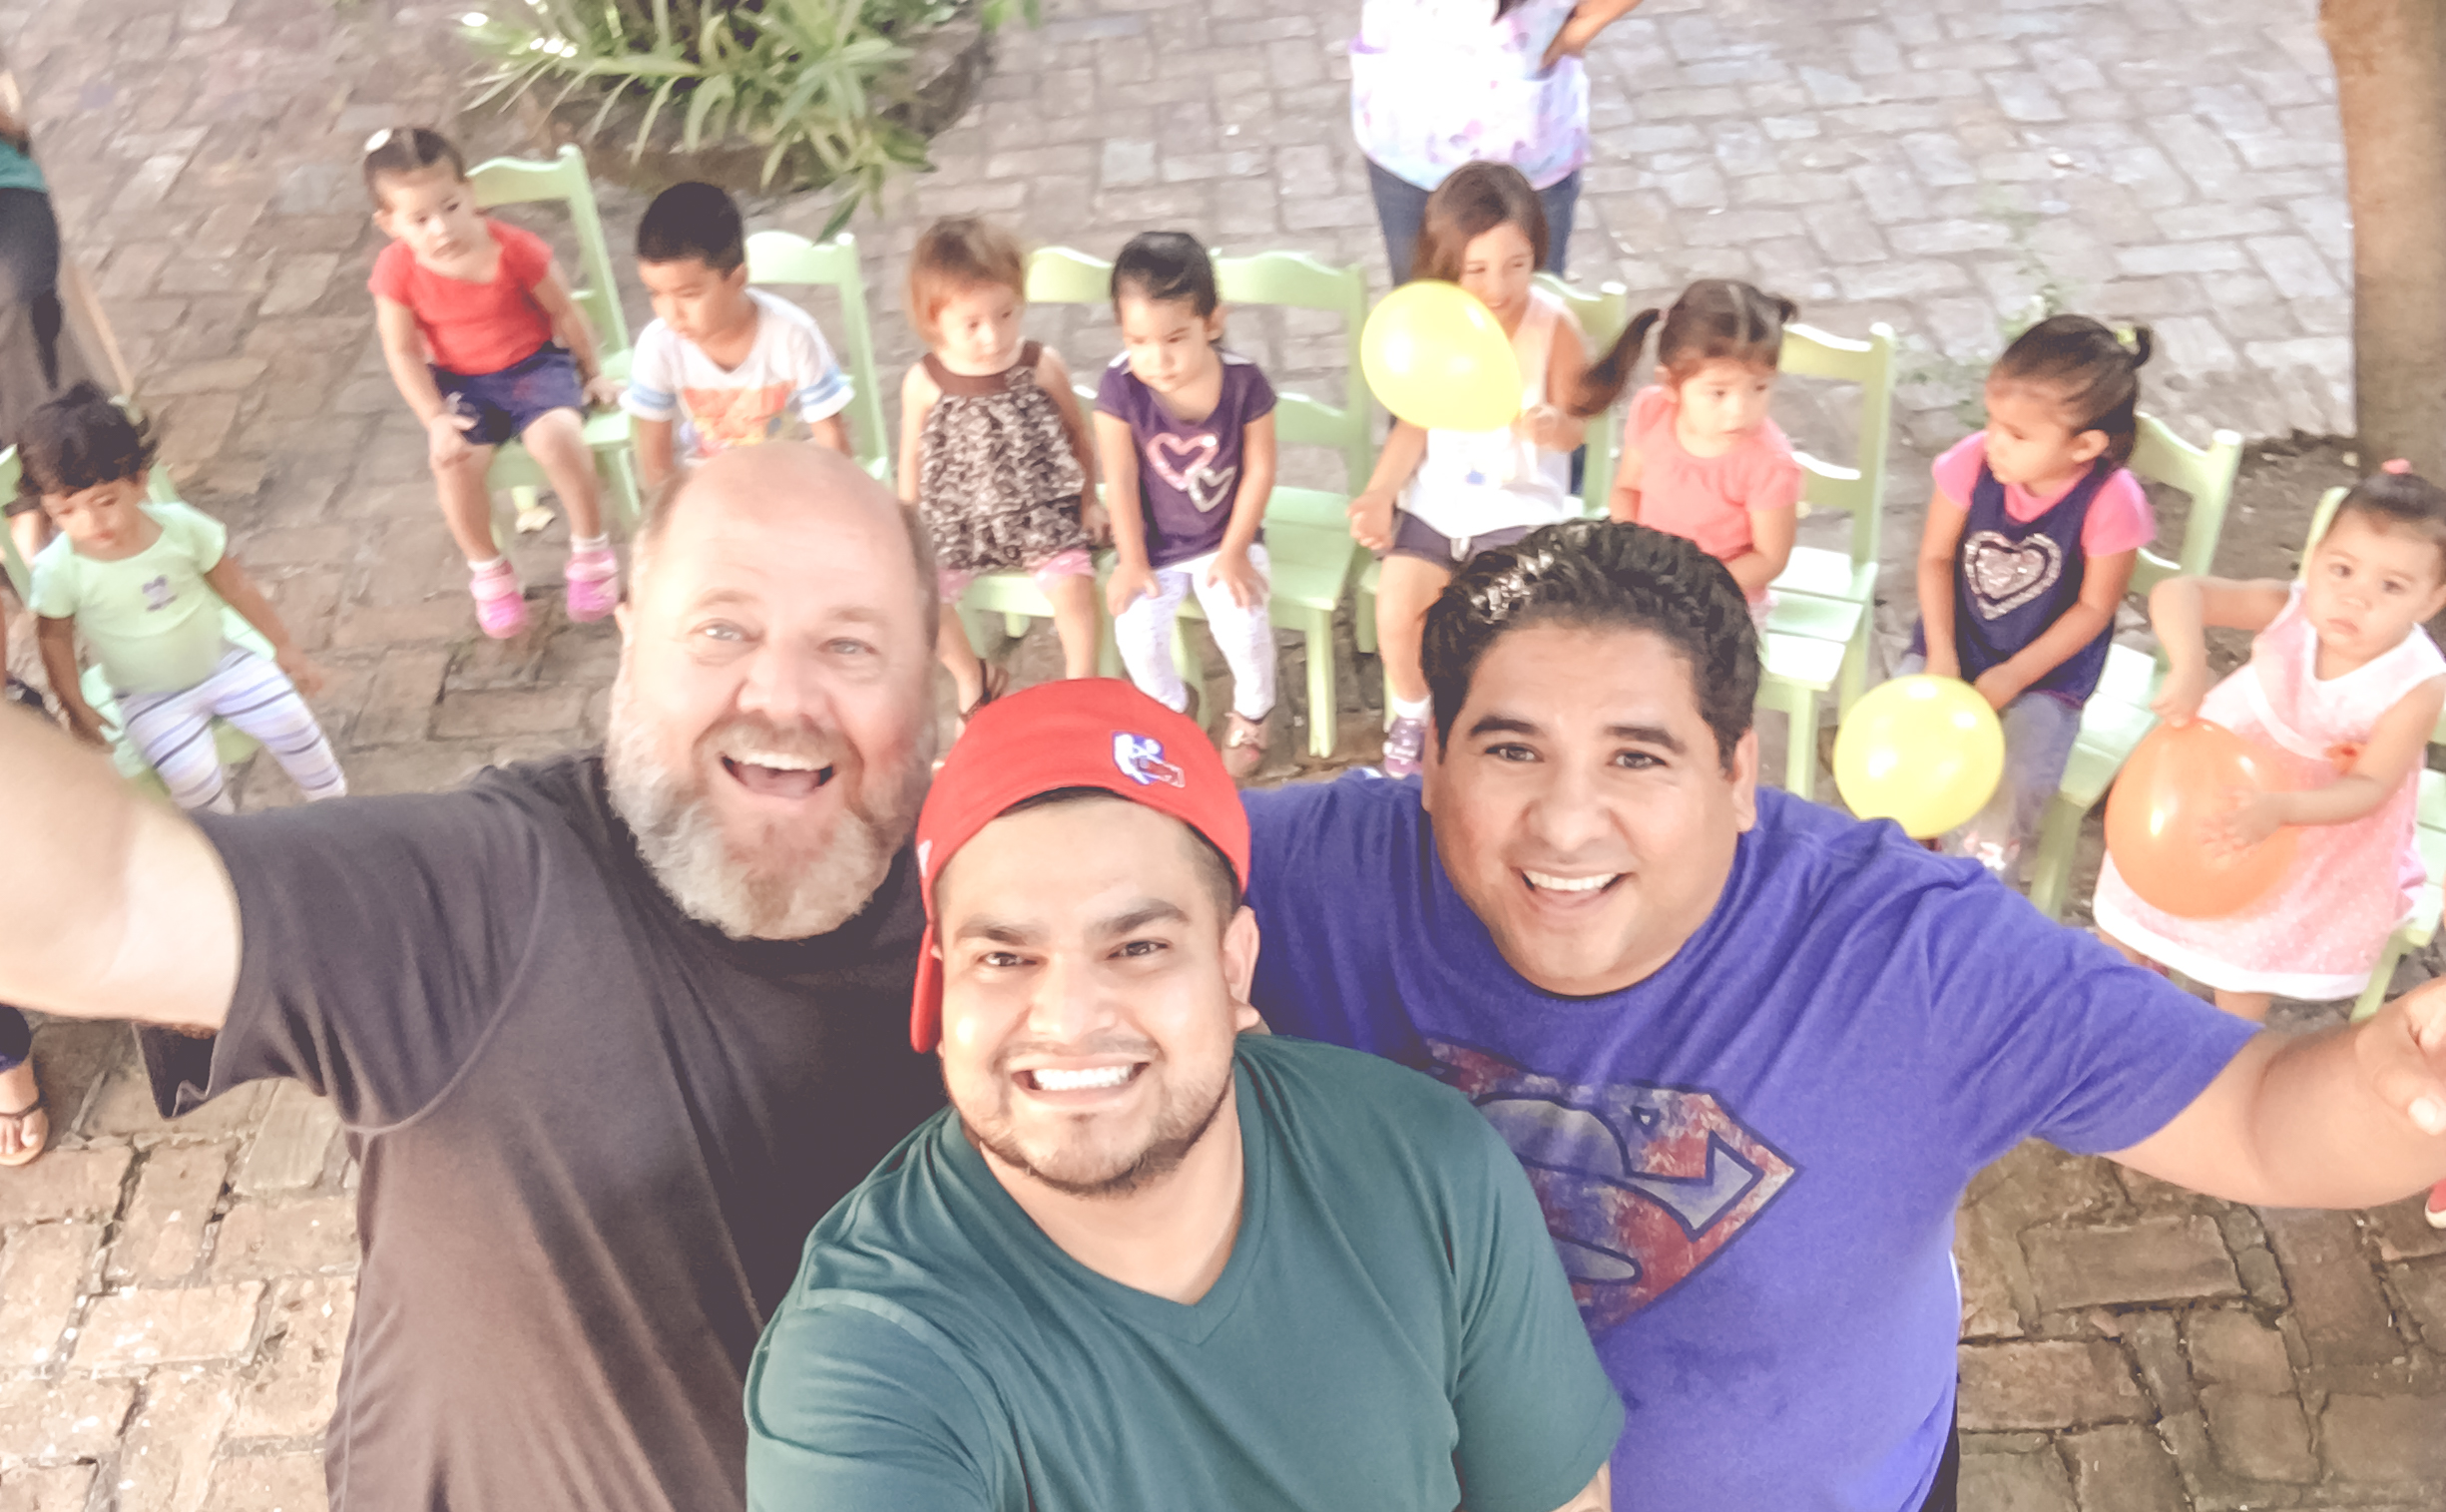 Tim-NLN, Jorge-Pinolero.com and JR INN - YouTube